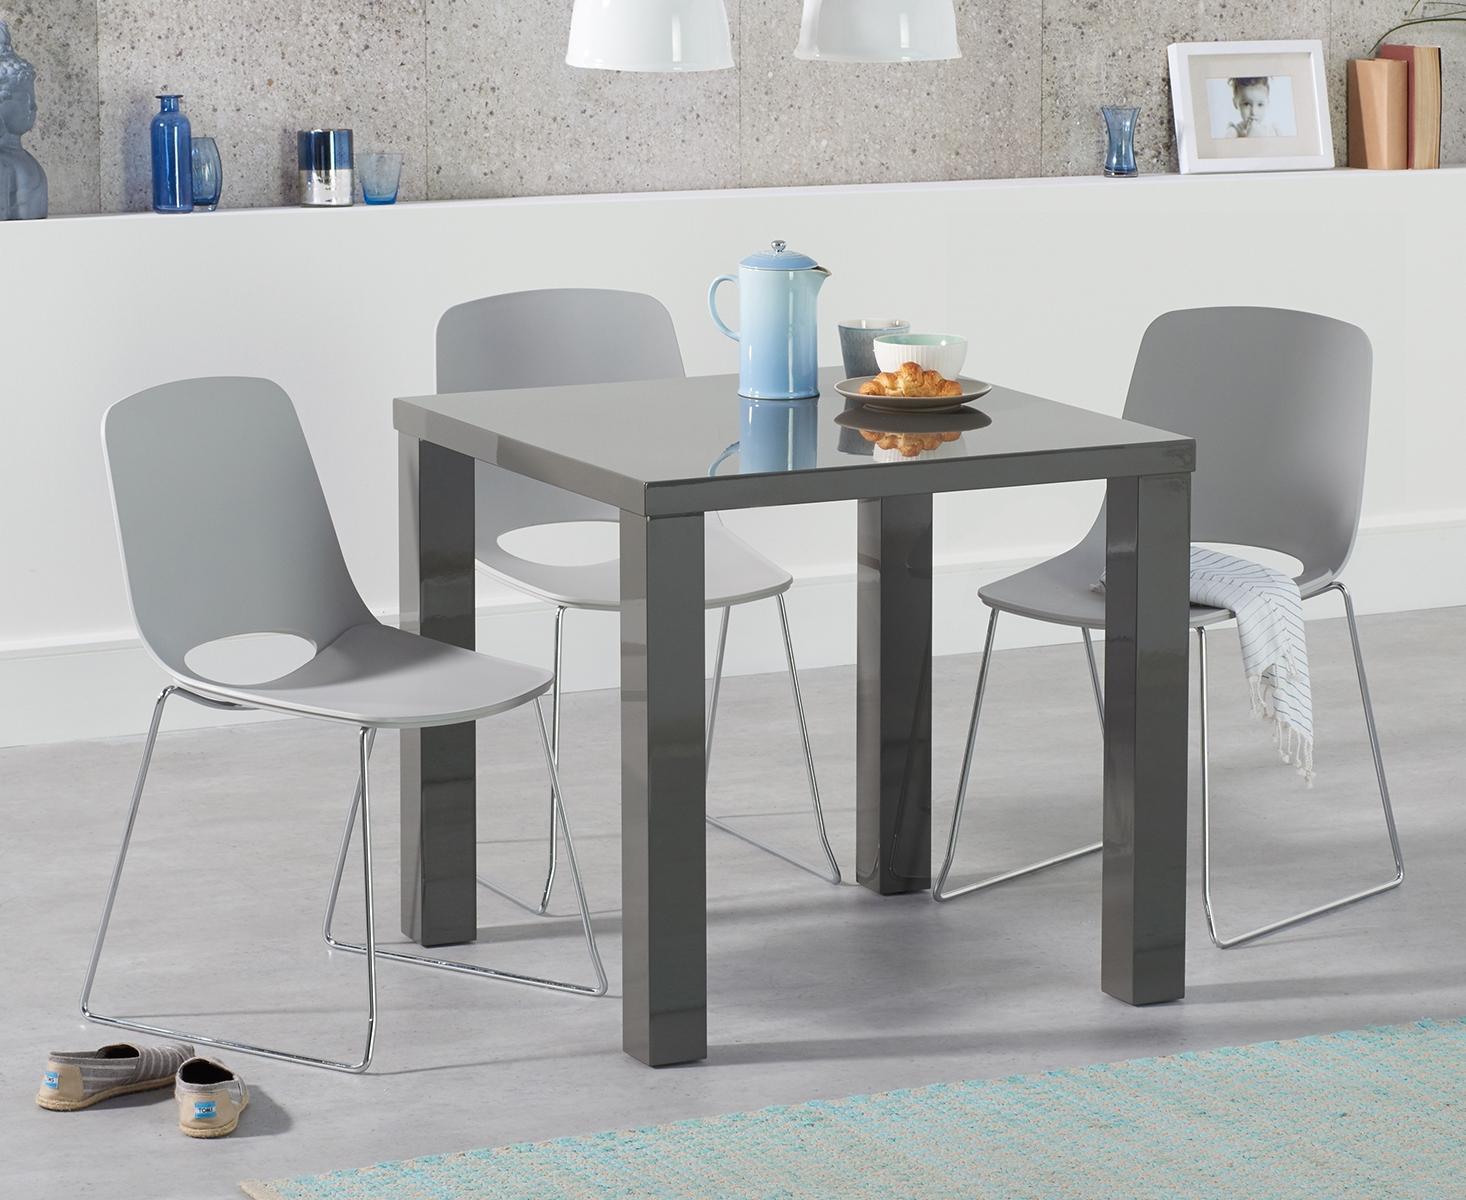 An image of Atlanta 80cm Dark Grey High Gloss Dining Table with Nordic Sled Chrome Leg Chair...